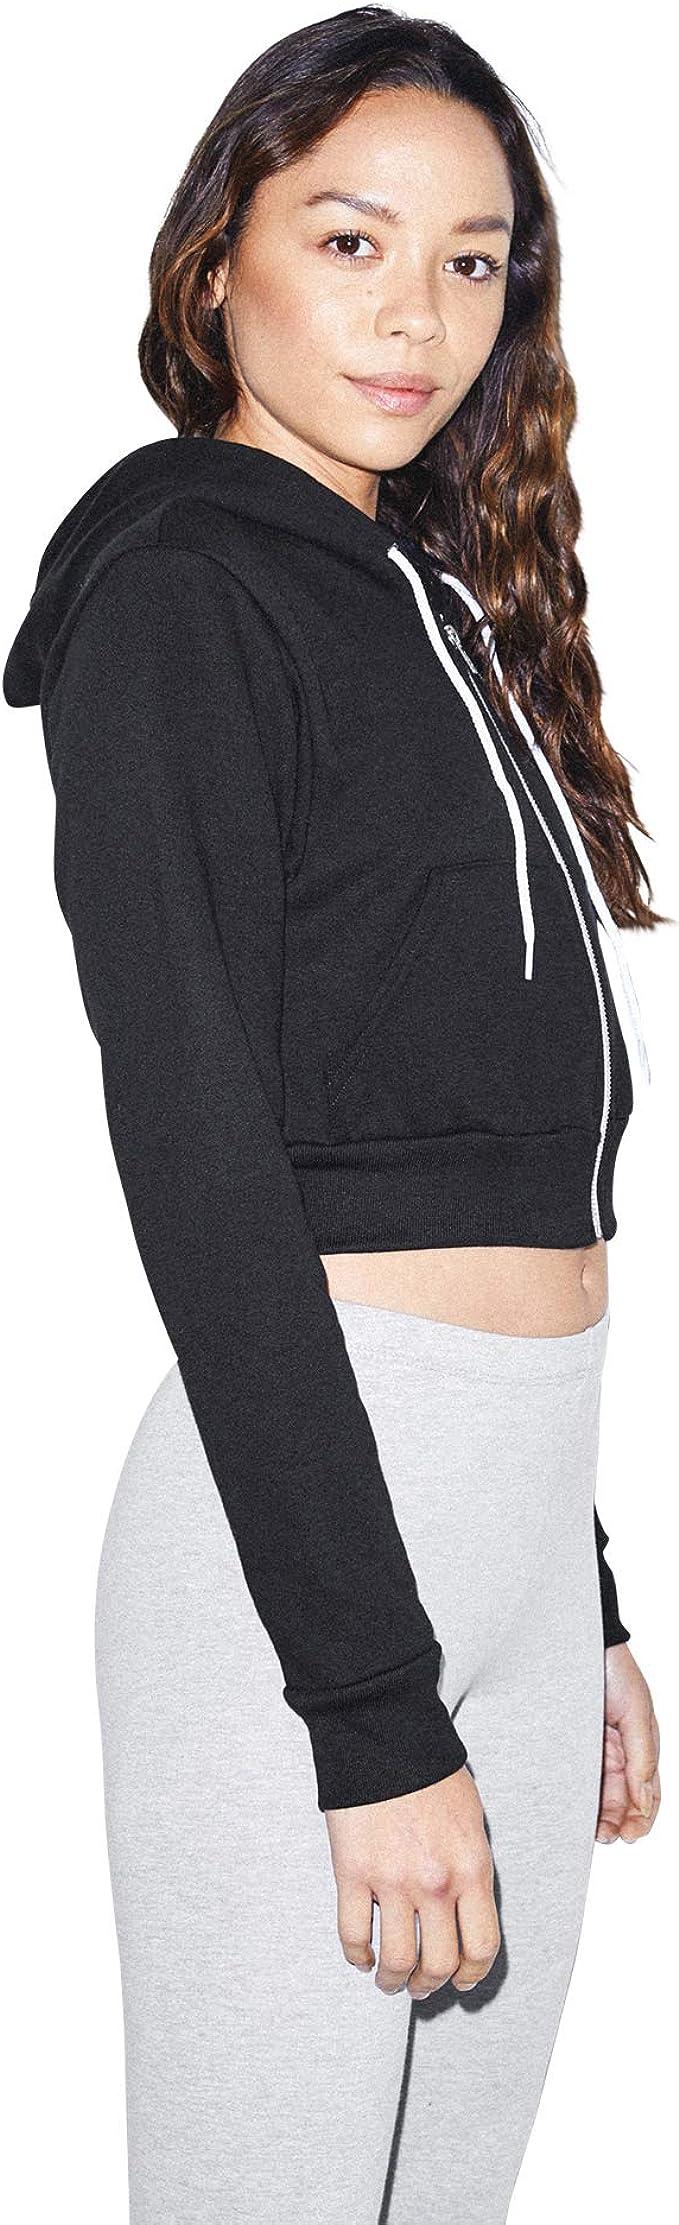 Women Long Sleeve Rolled Hoodie Sweatshirt Top with Pocket Sun Palm Trees